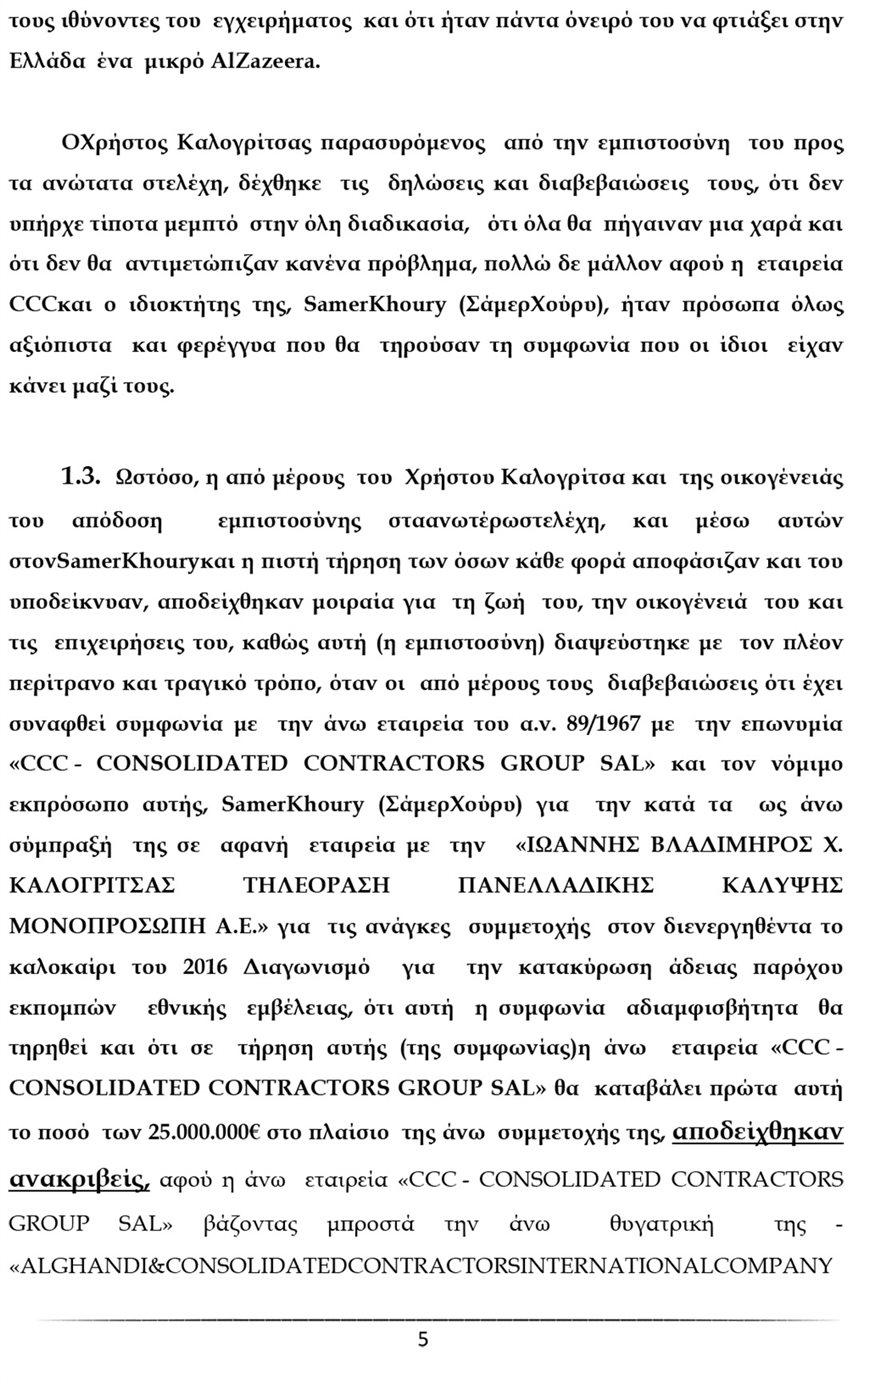 ypomnima-5